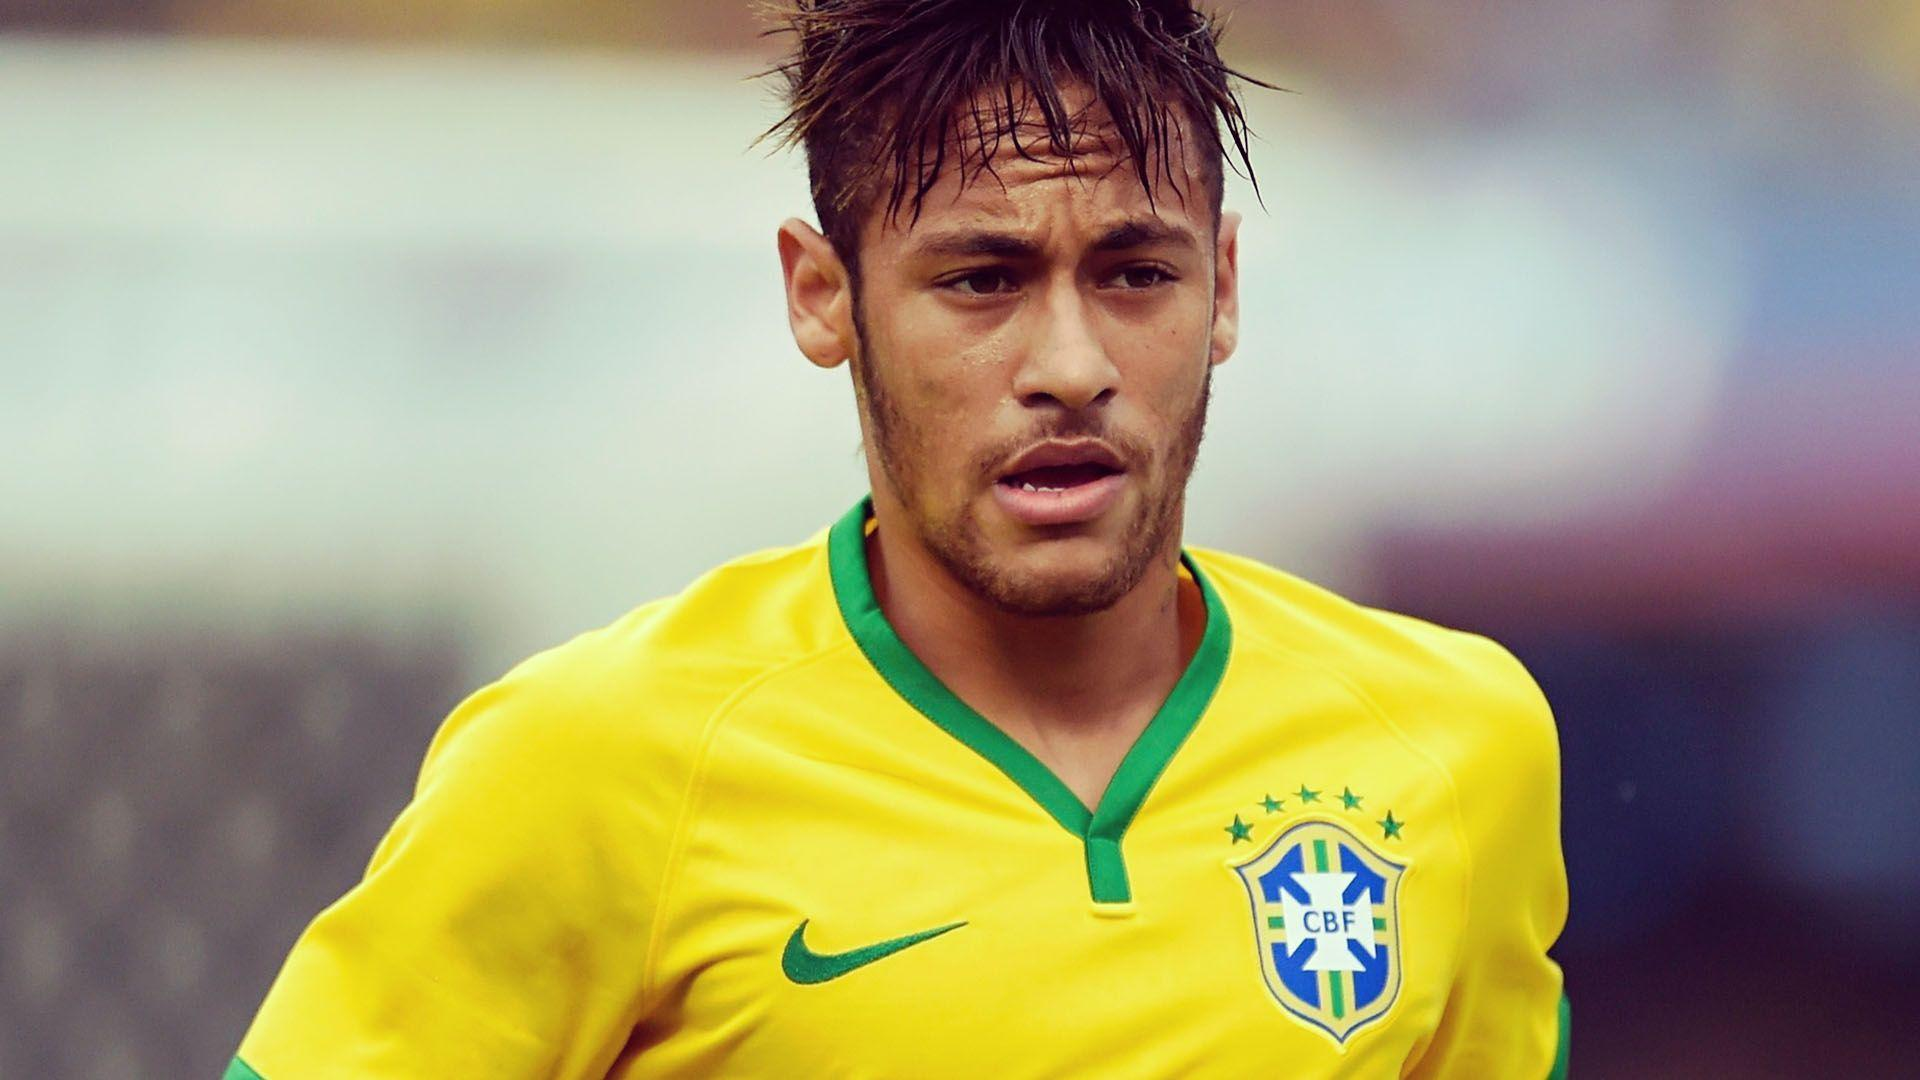 neymar - photo #15